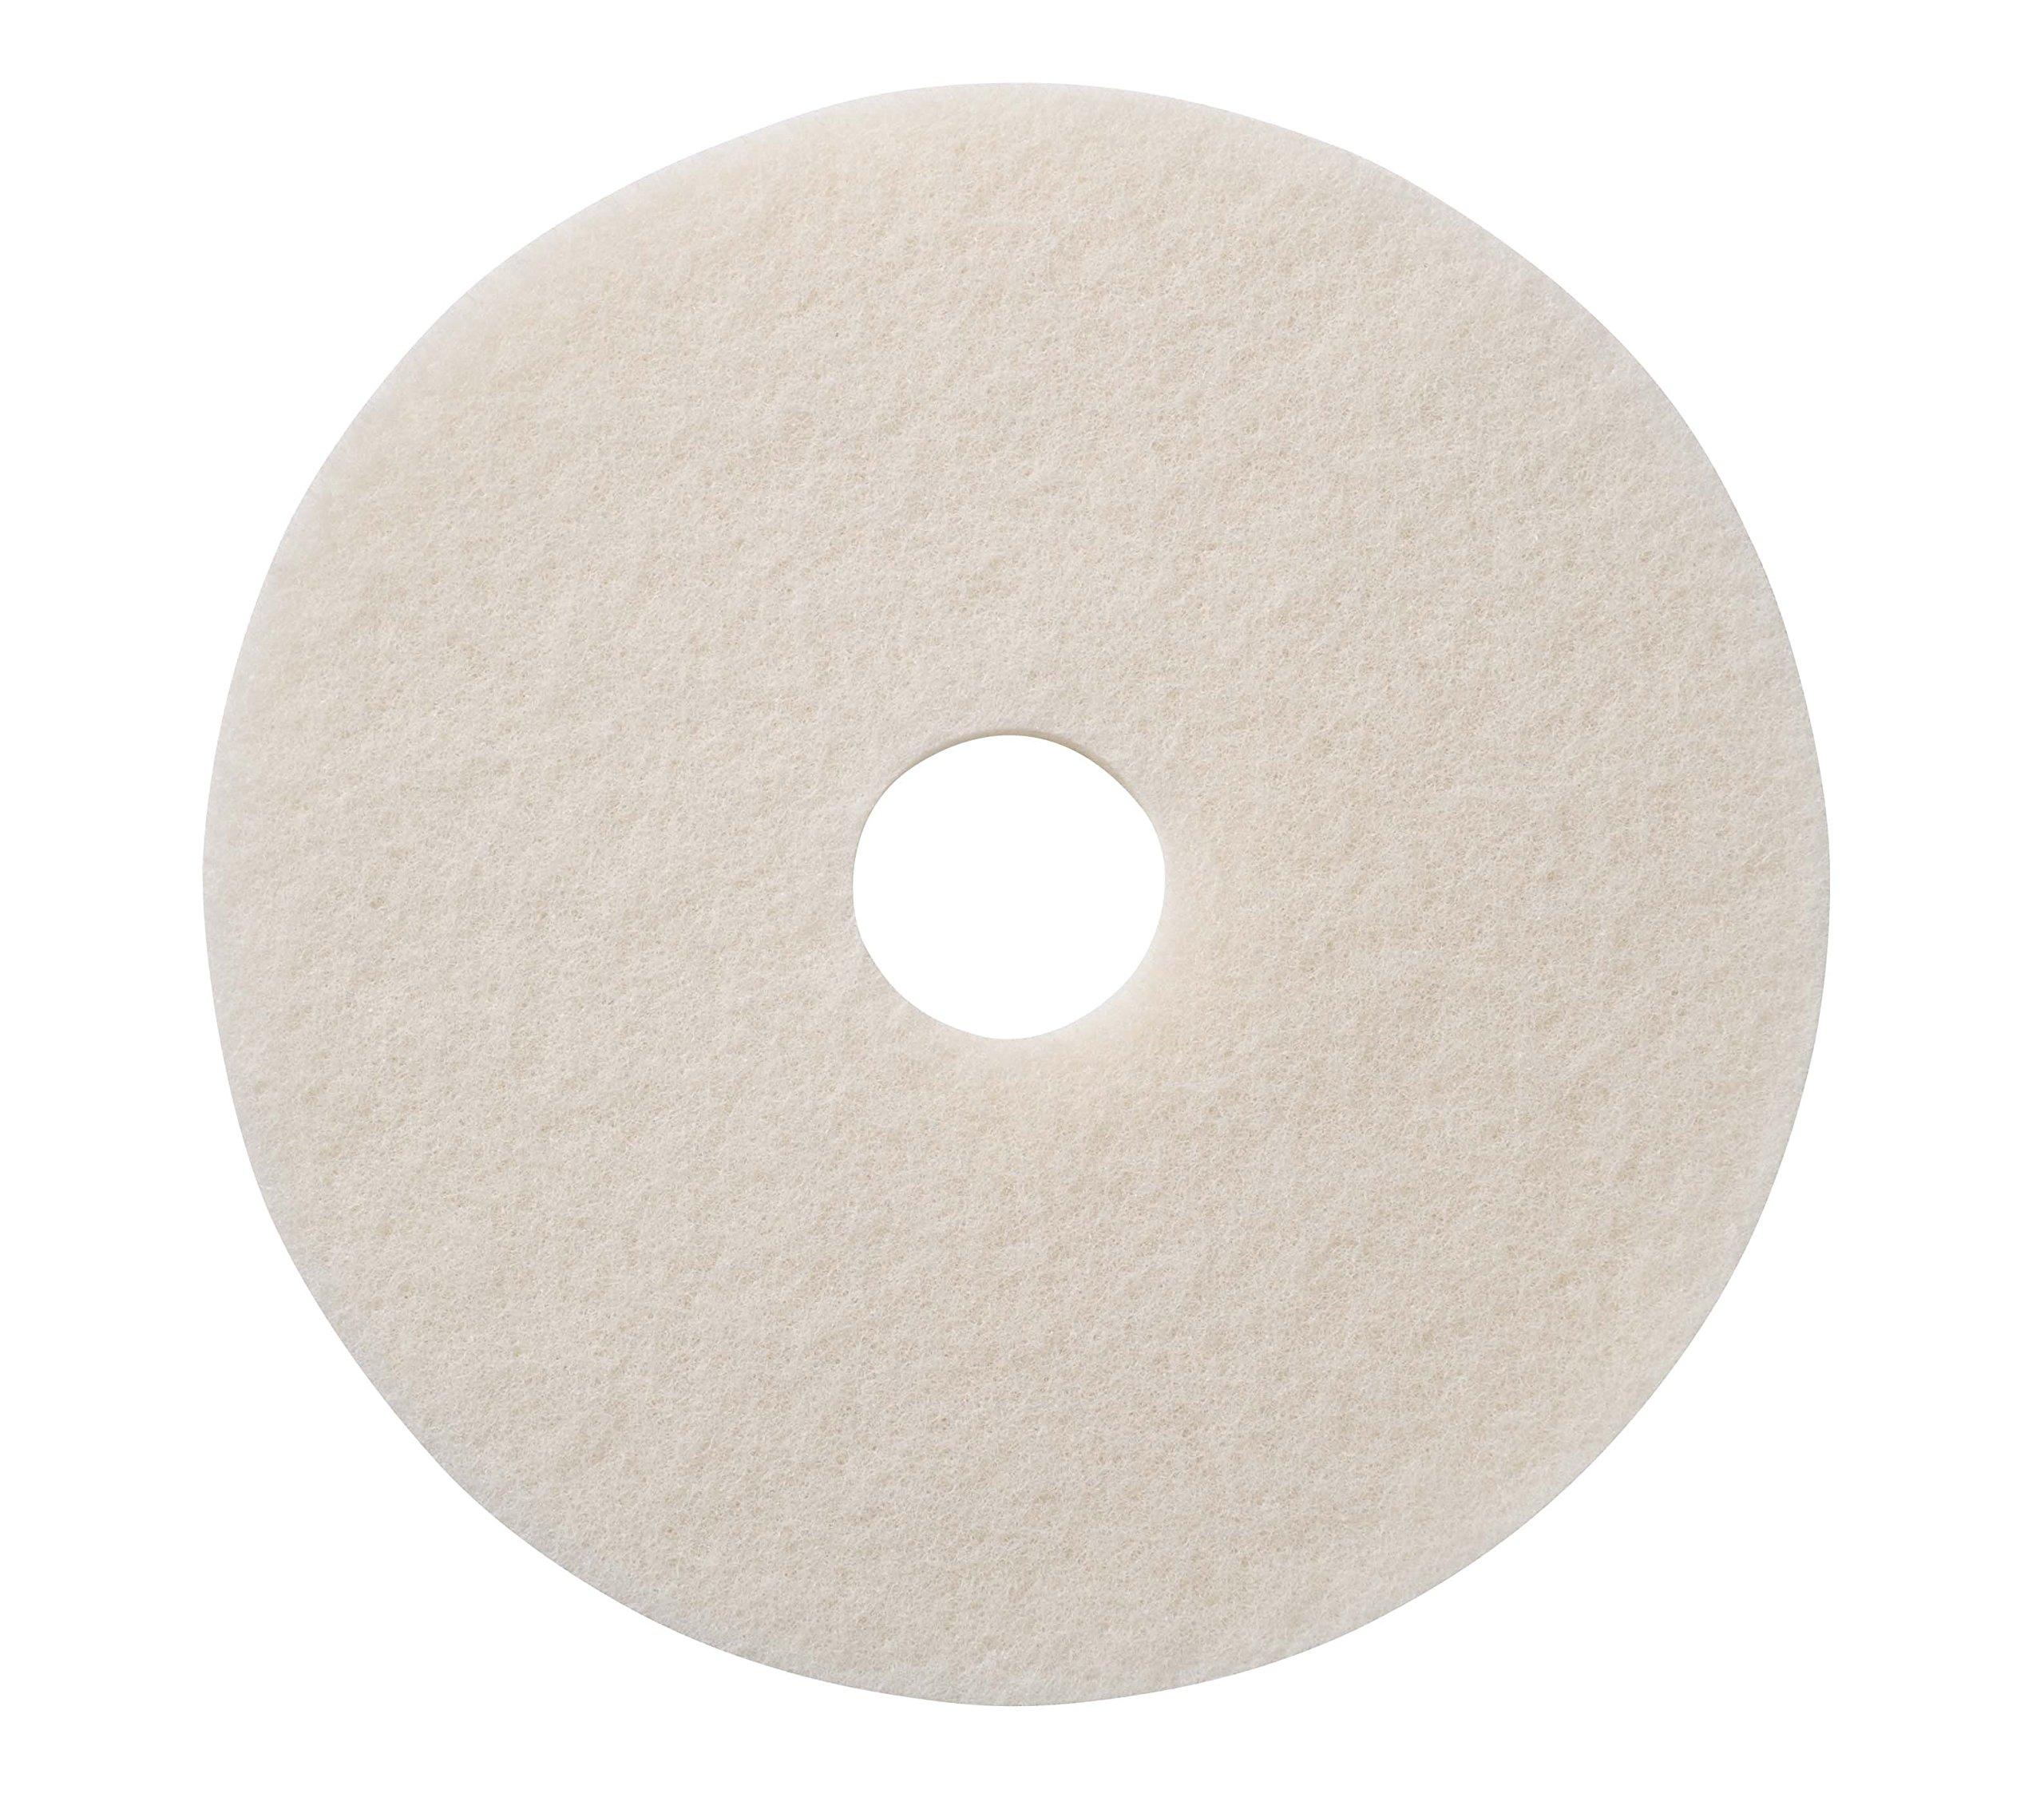 Glit / Microtron 401217 Super Polishing Pad, 17'', White (Pack of 5)